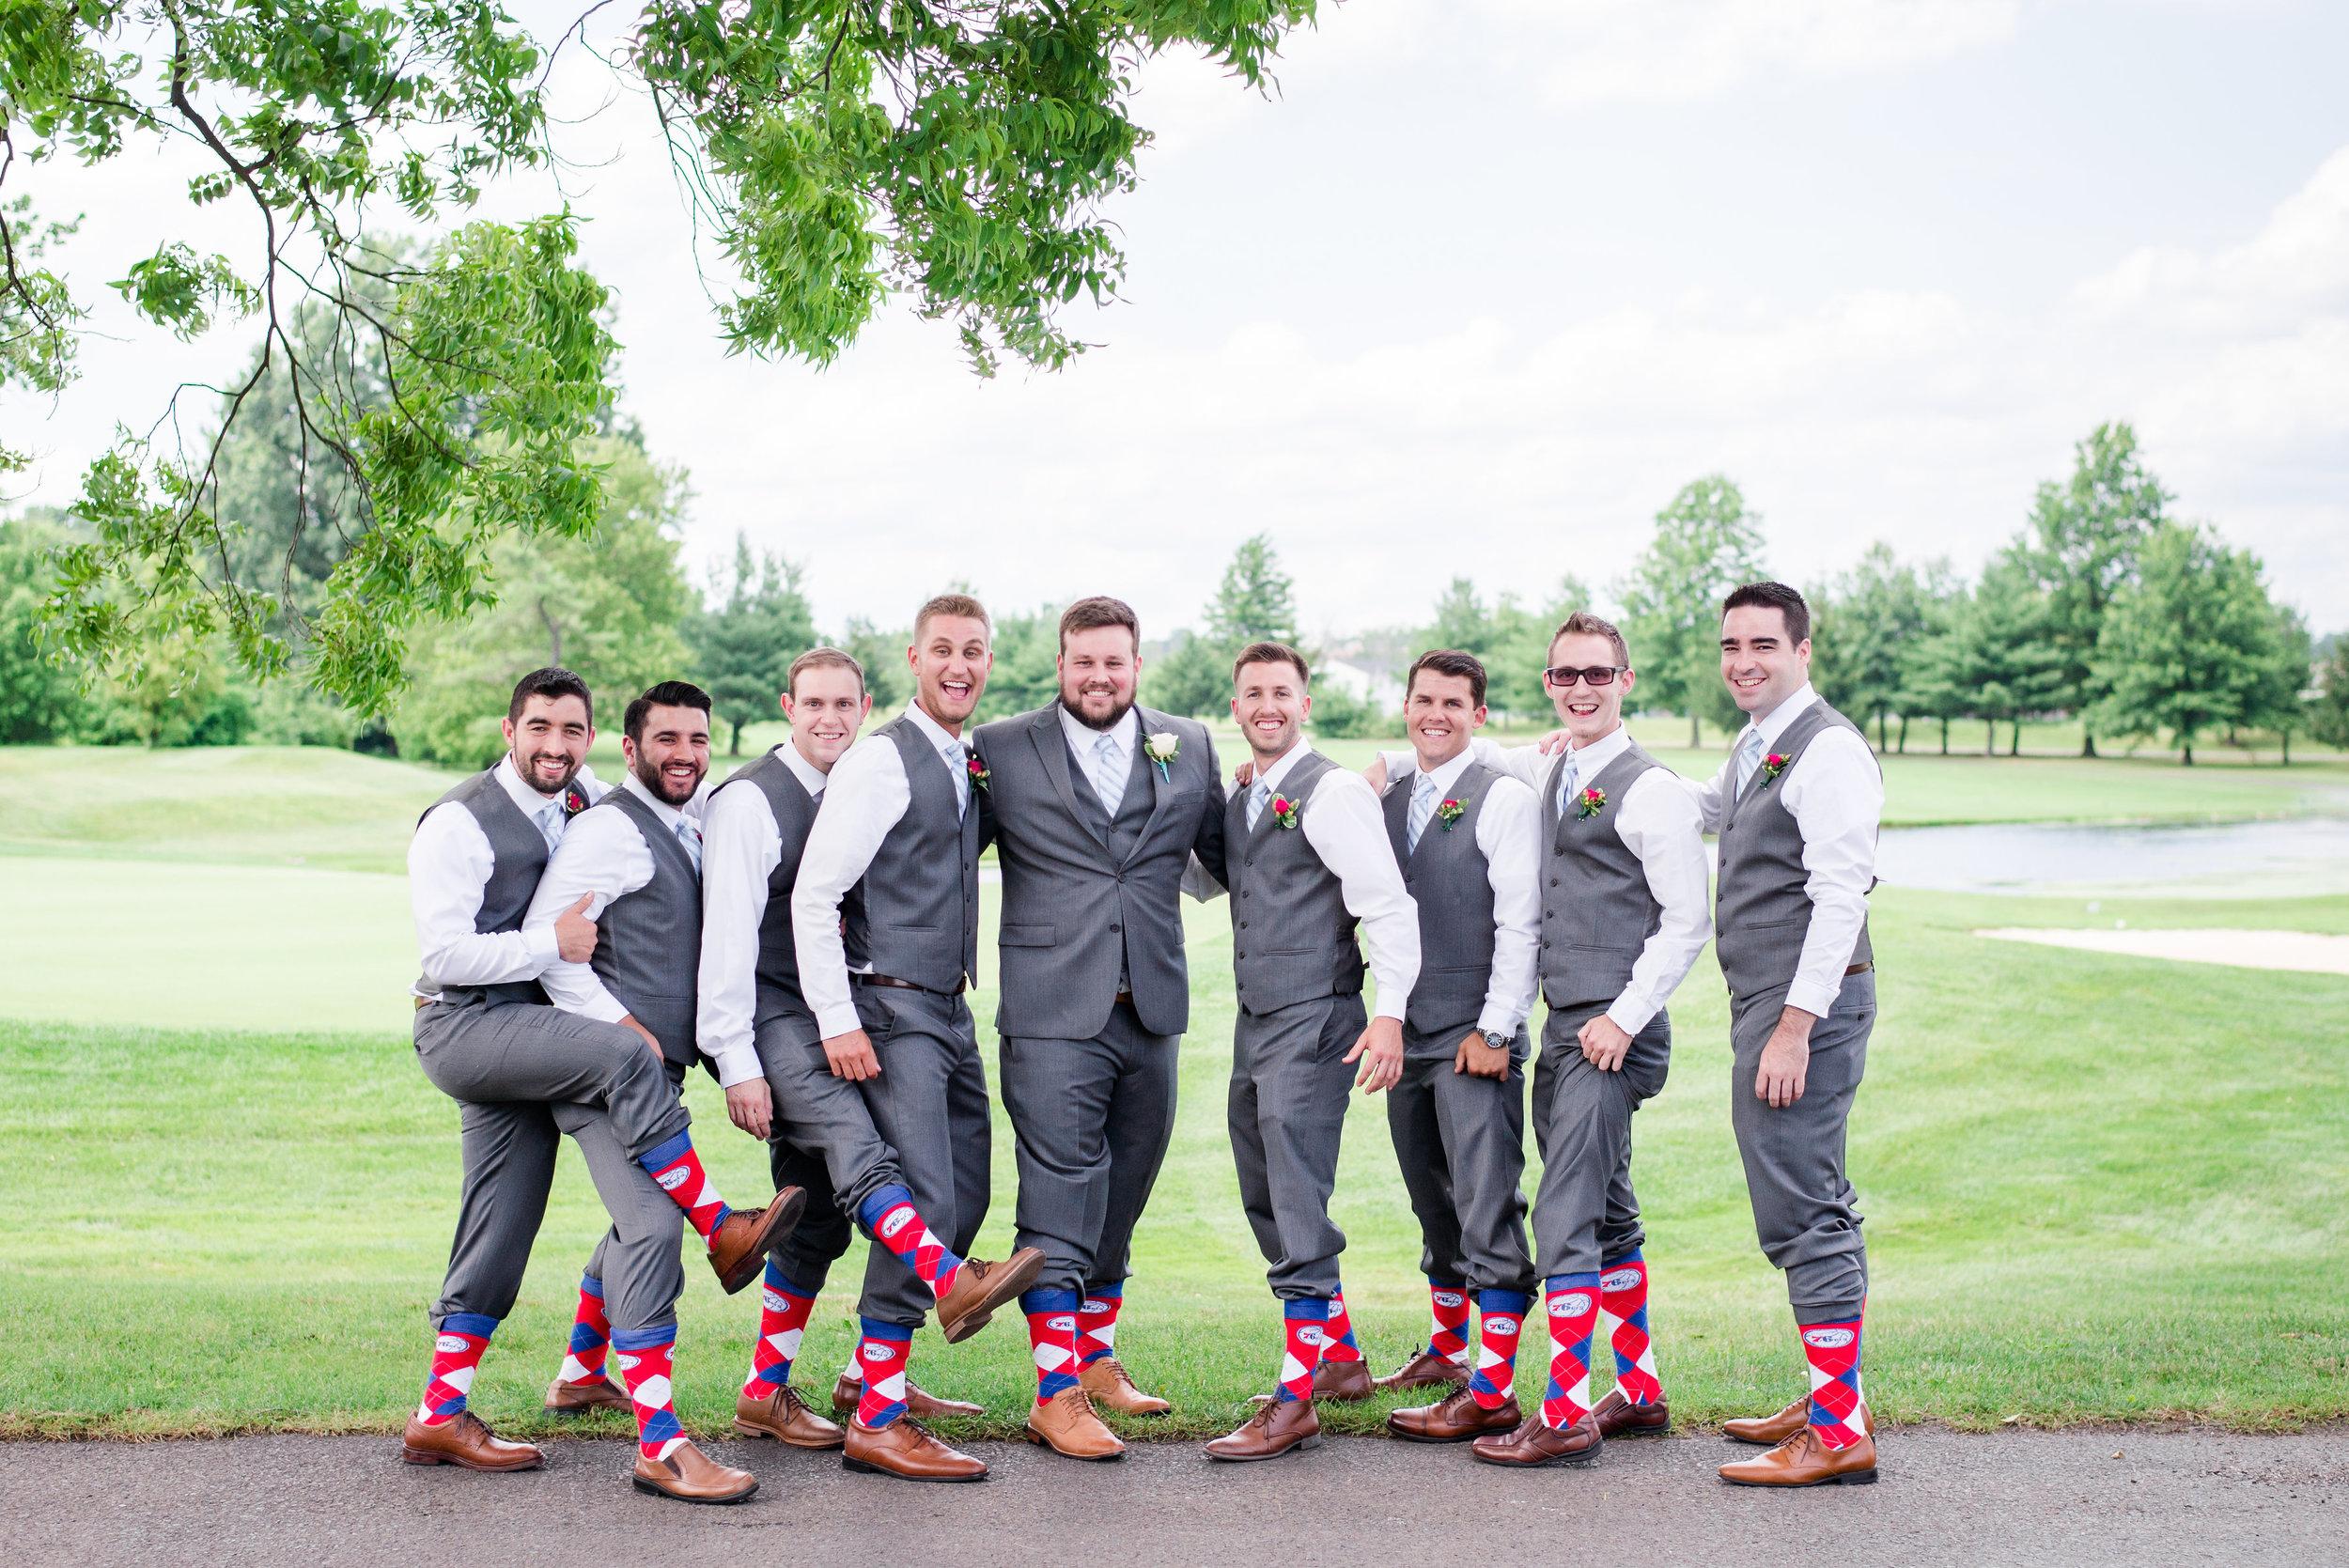 Bucks_County_Pennsylvania_Wilson_Wedding_Photographer_Andrea_Krout_Photography-143.jpg